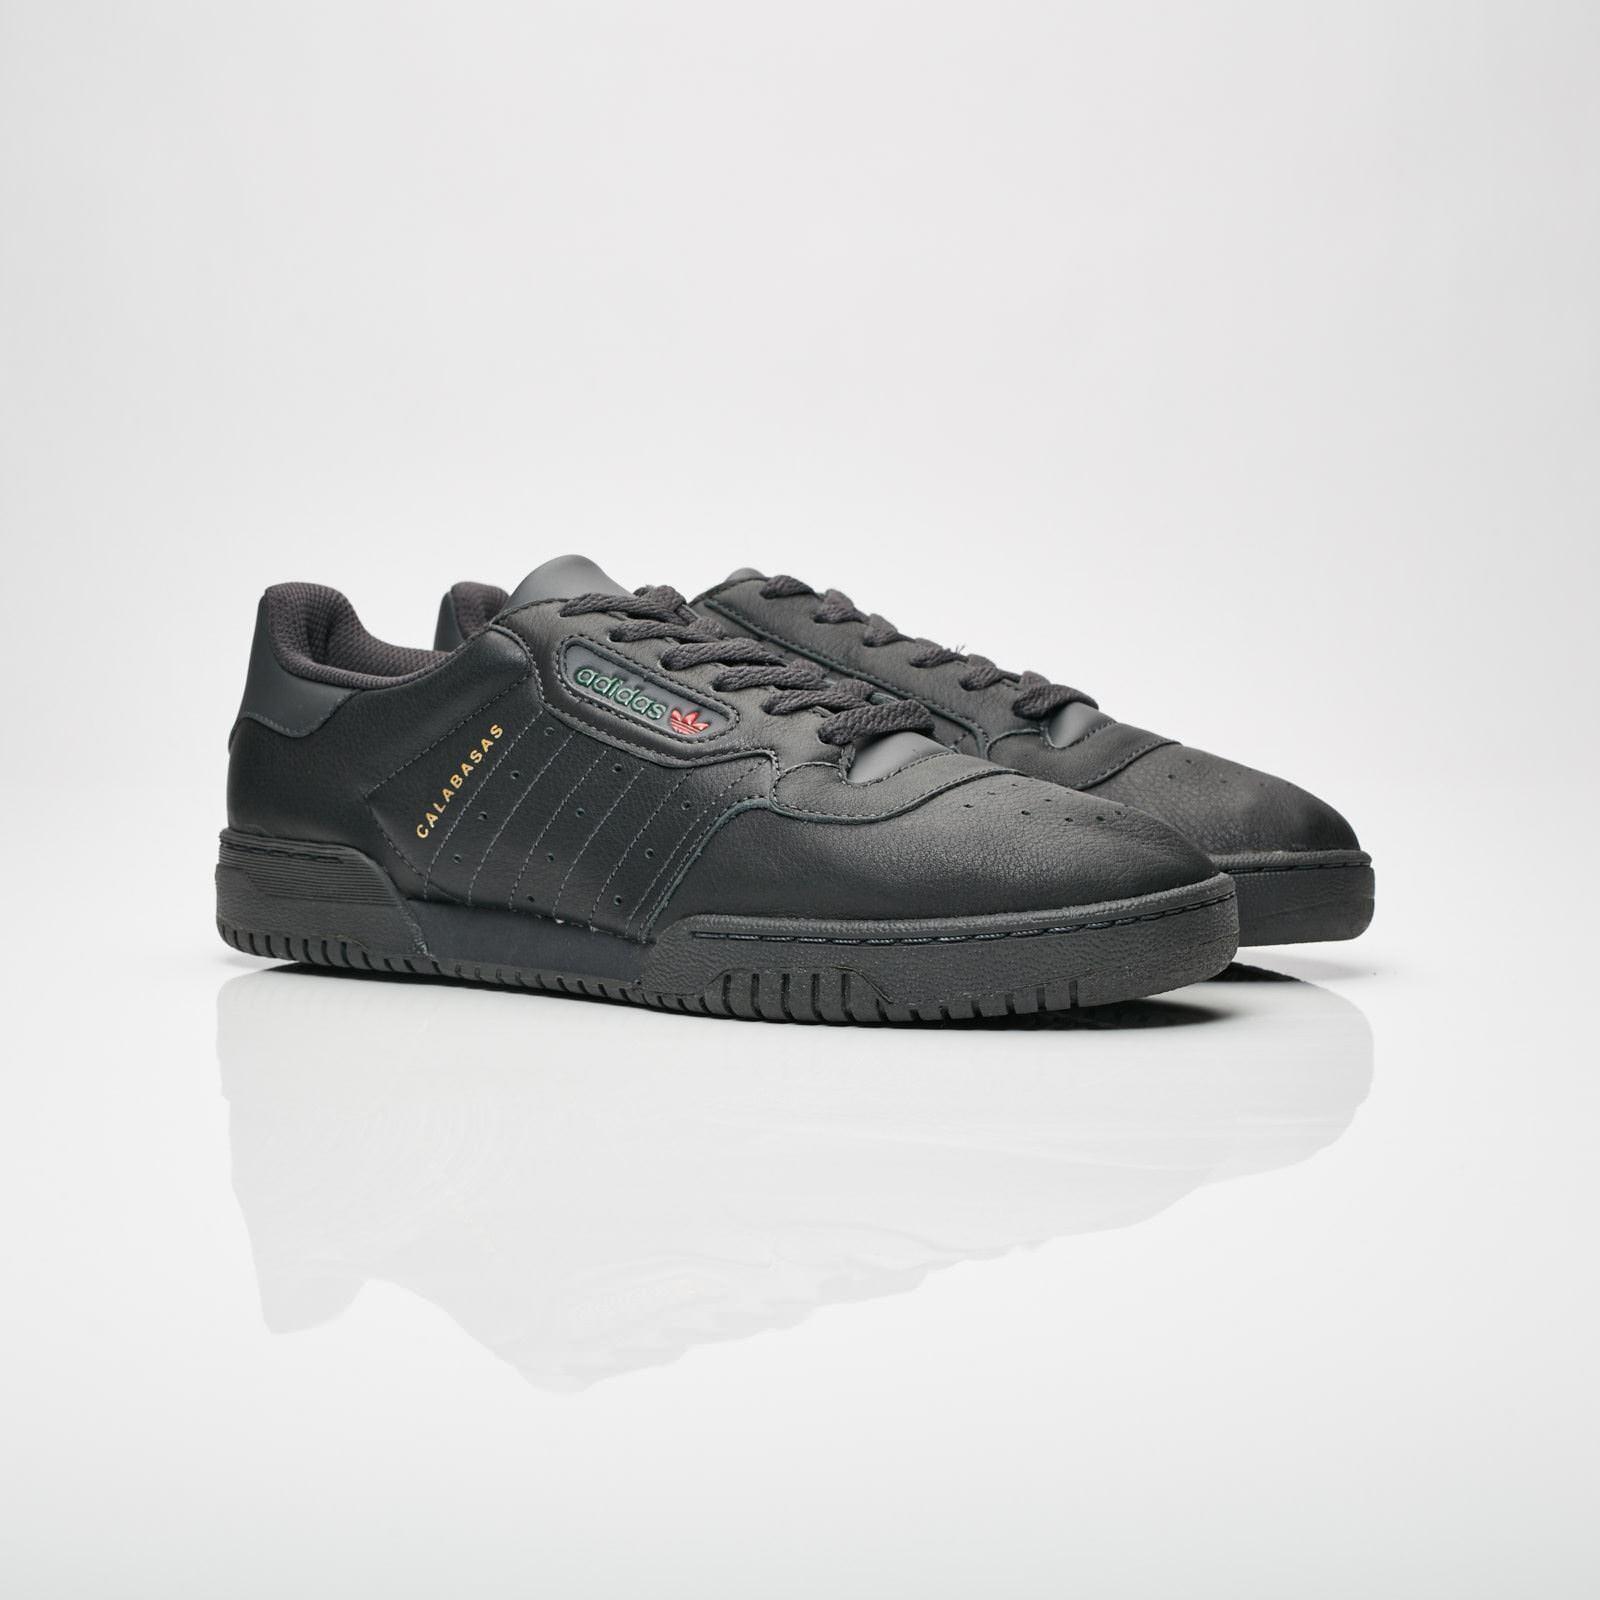 Adidas Powerphase Calabasas Black Trainers CG6420